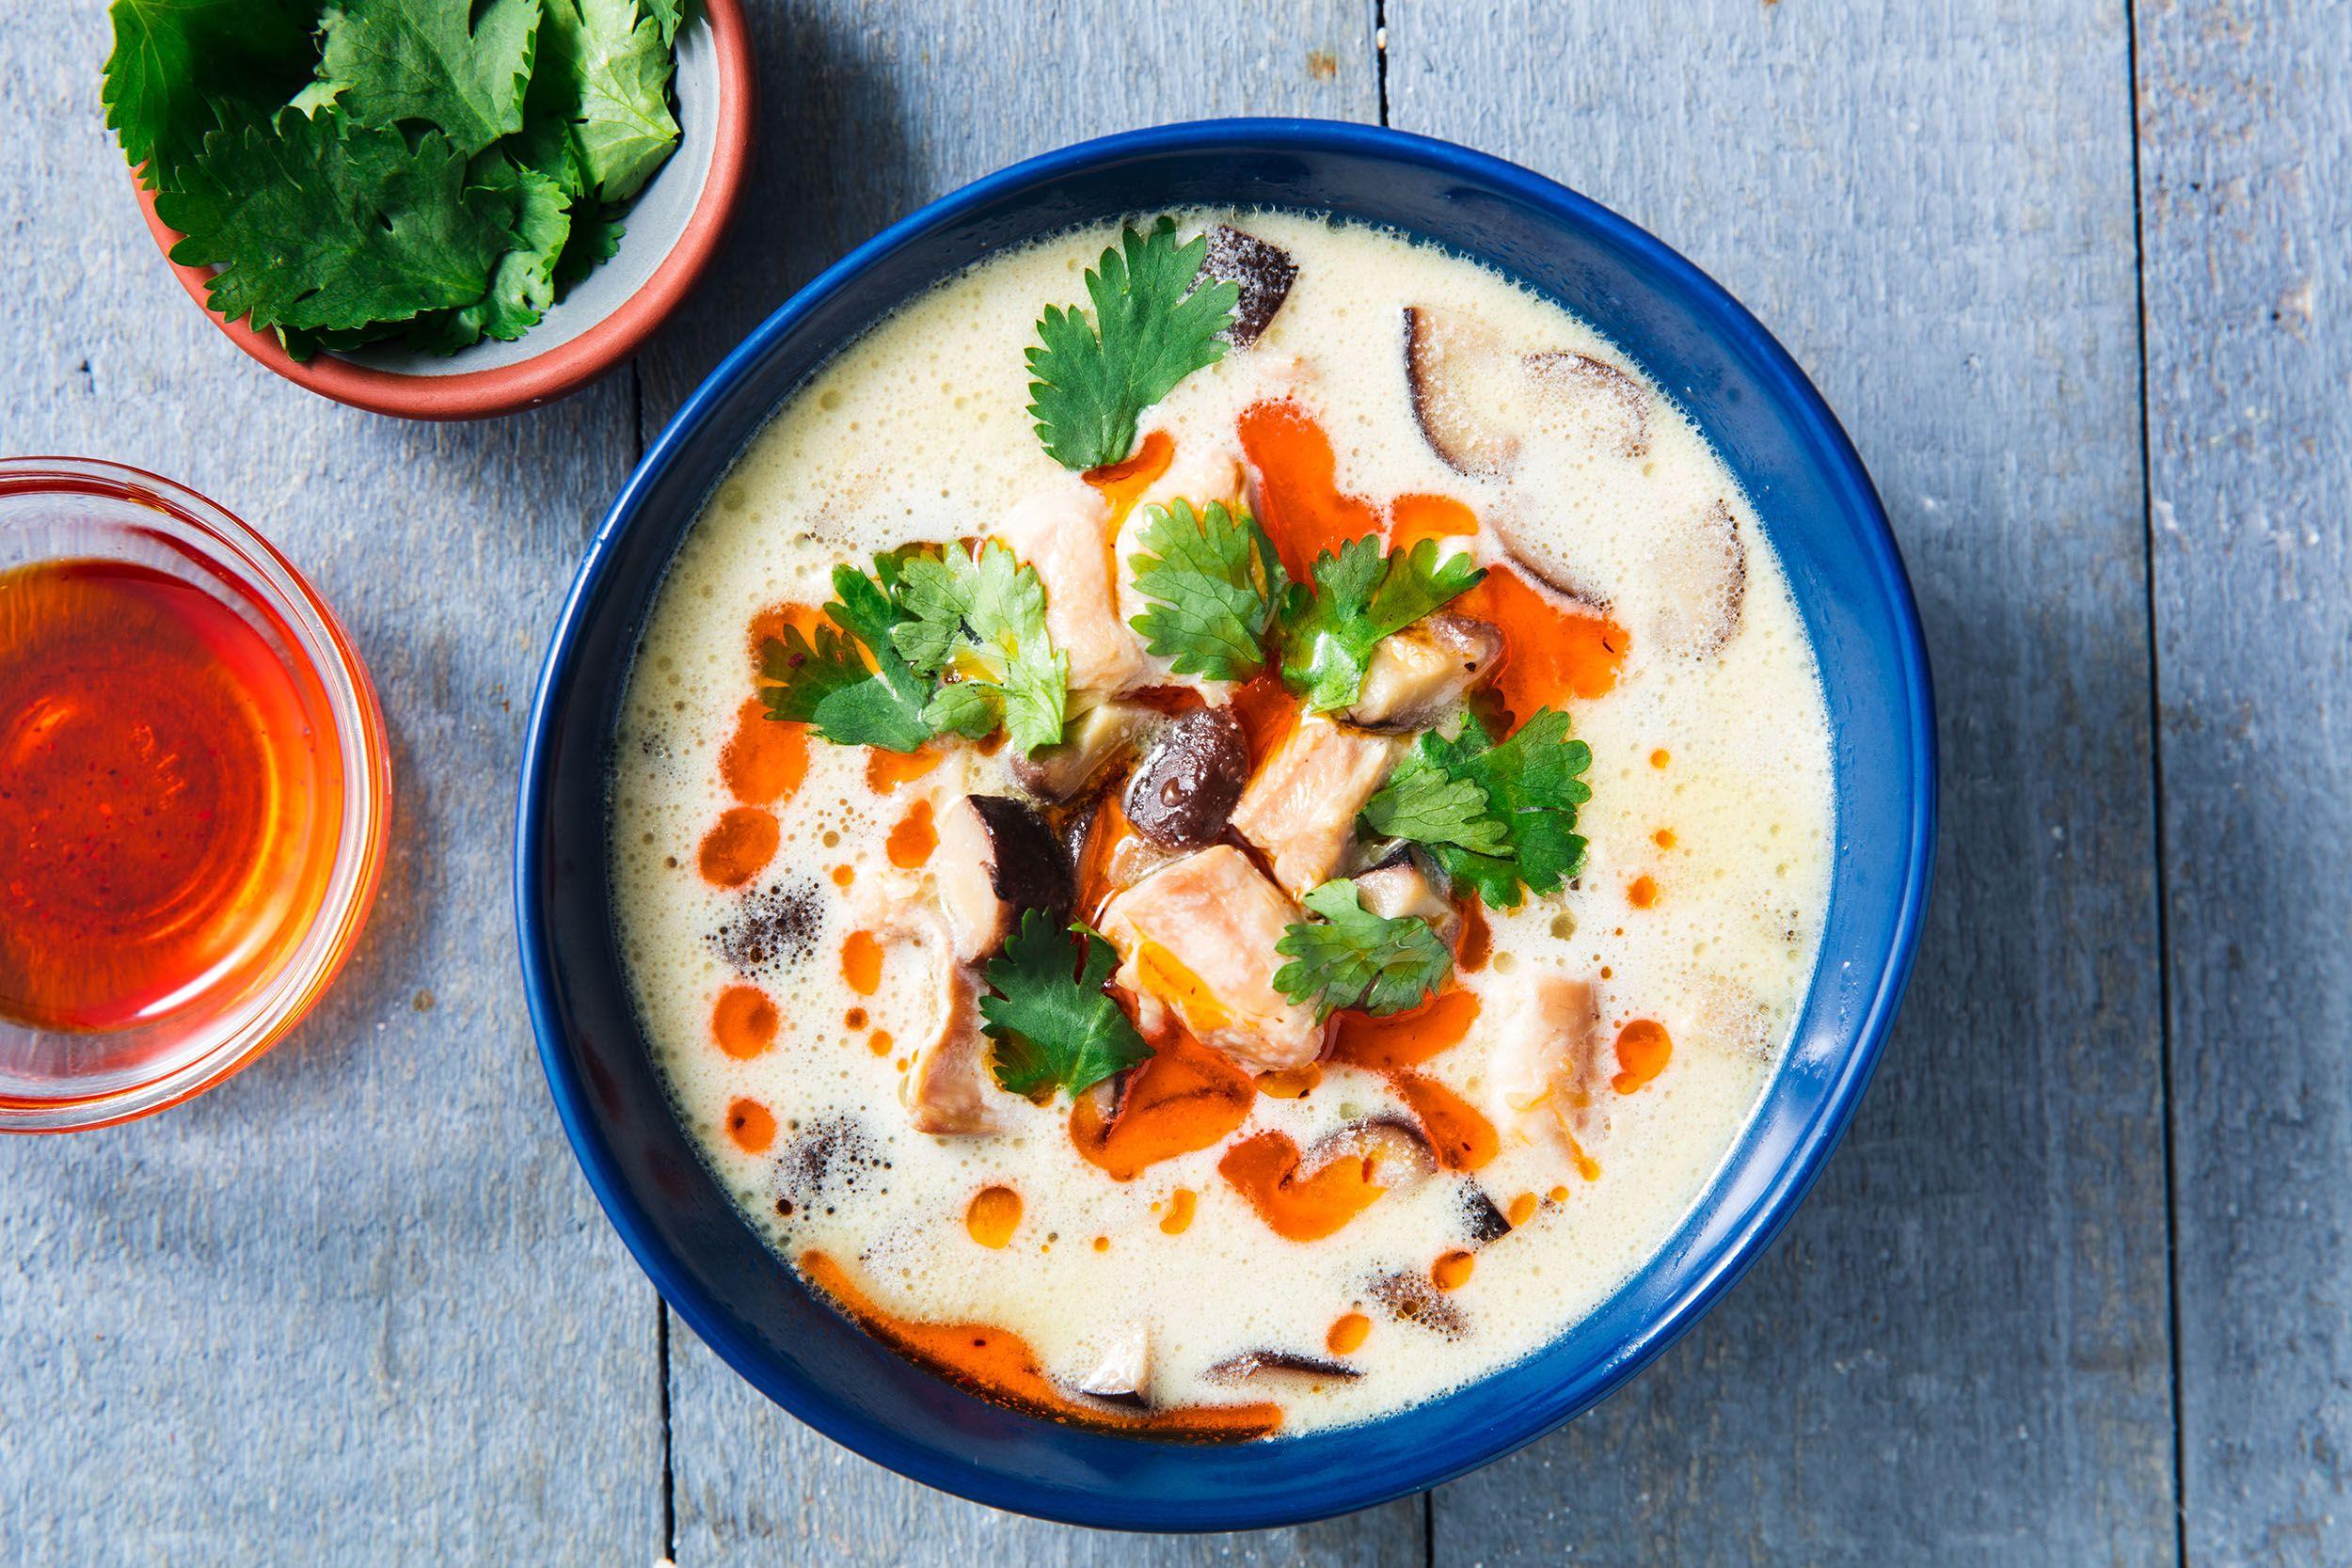 https://hips.hearstapps.com/hmg-prod.s3.amazonaws.com/images/thai-chicken-coconut-soup-horizontal-1526596737.jpg